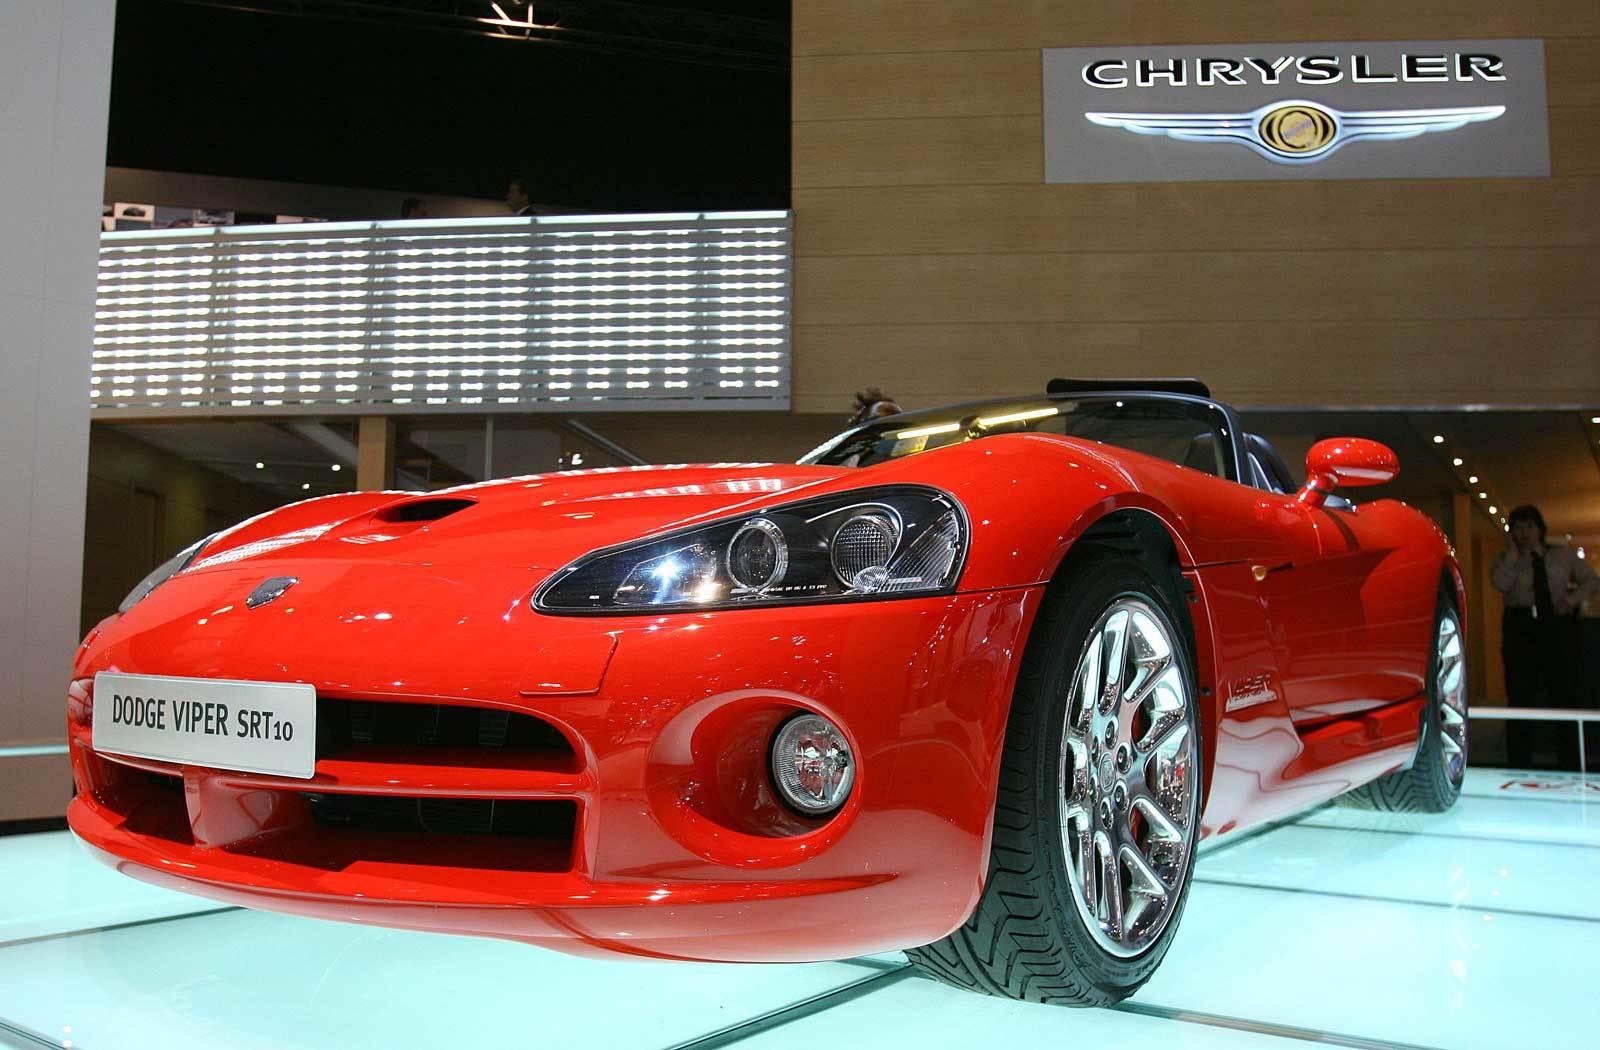 62 2005 Salon Automovil Barcelona Dodge Viper Srt10